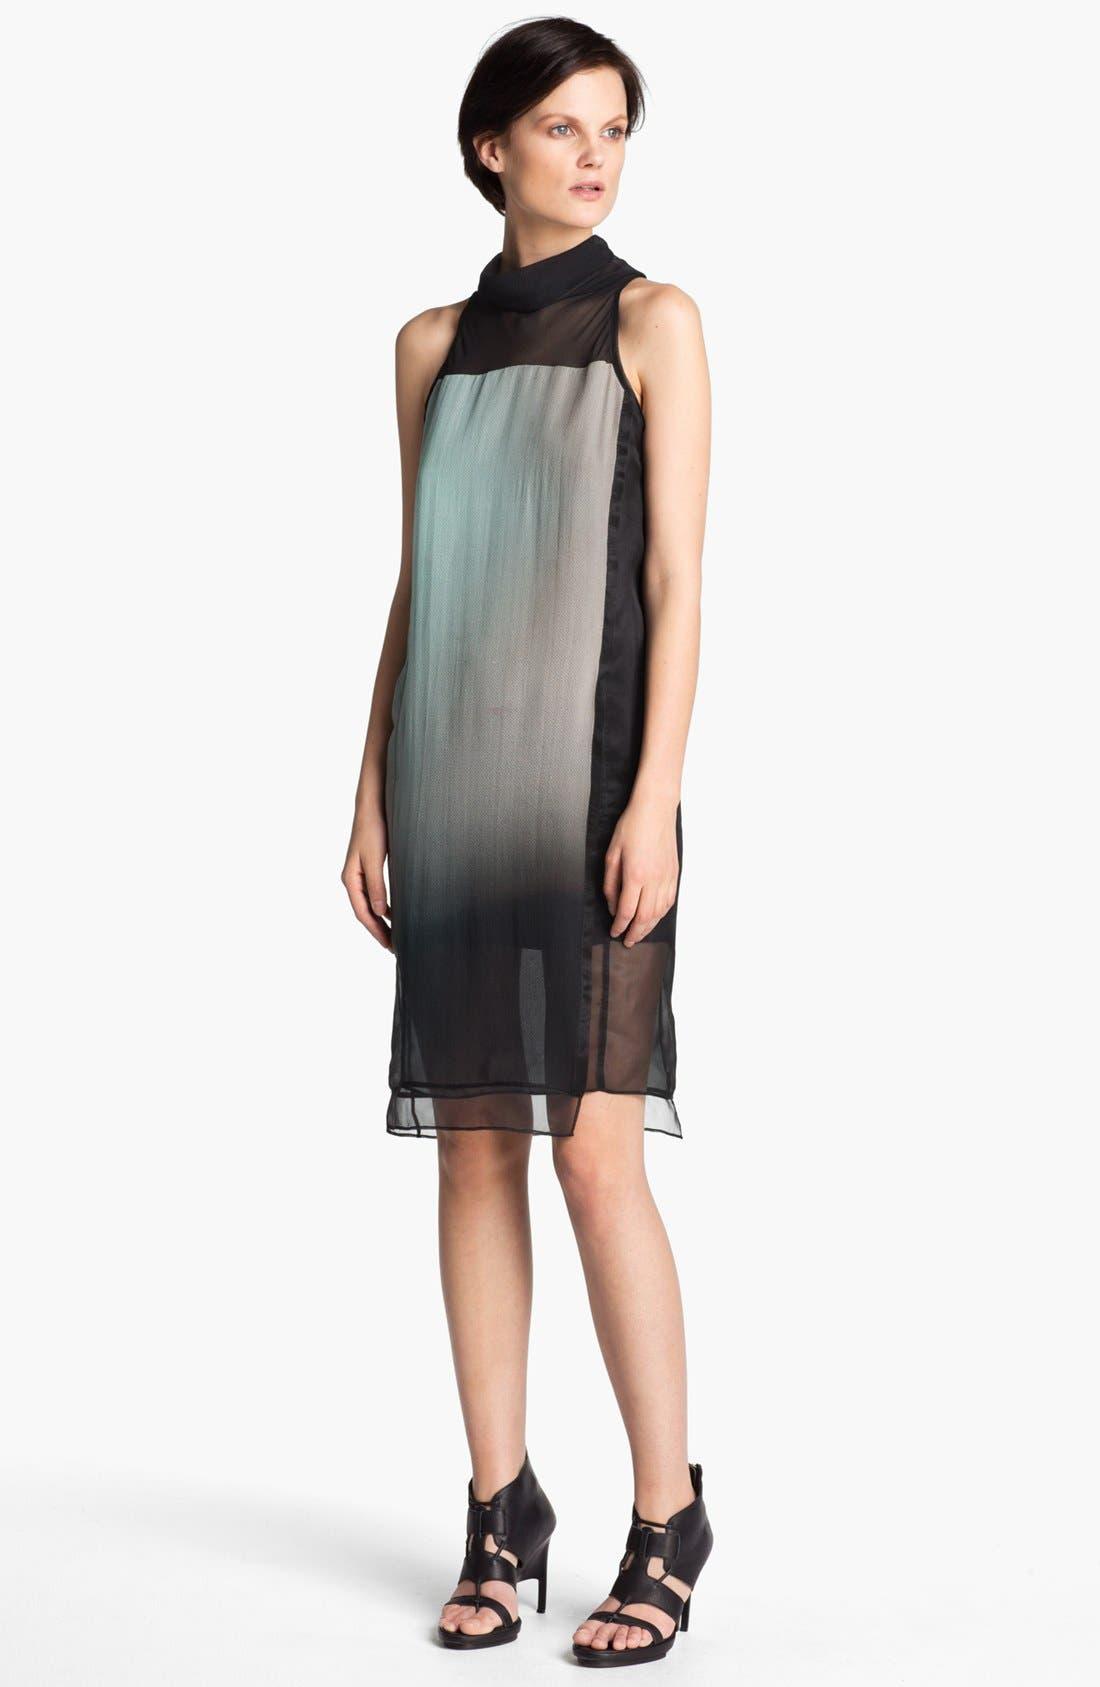 Main Image - Helmut Lang 'Mercury' Ombré Organza Dress